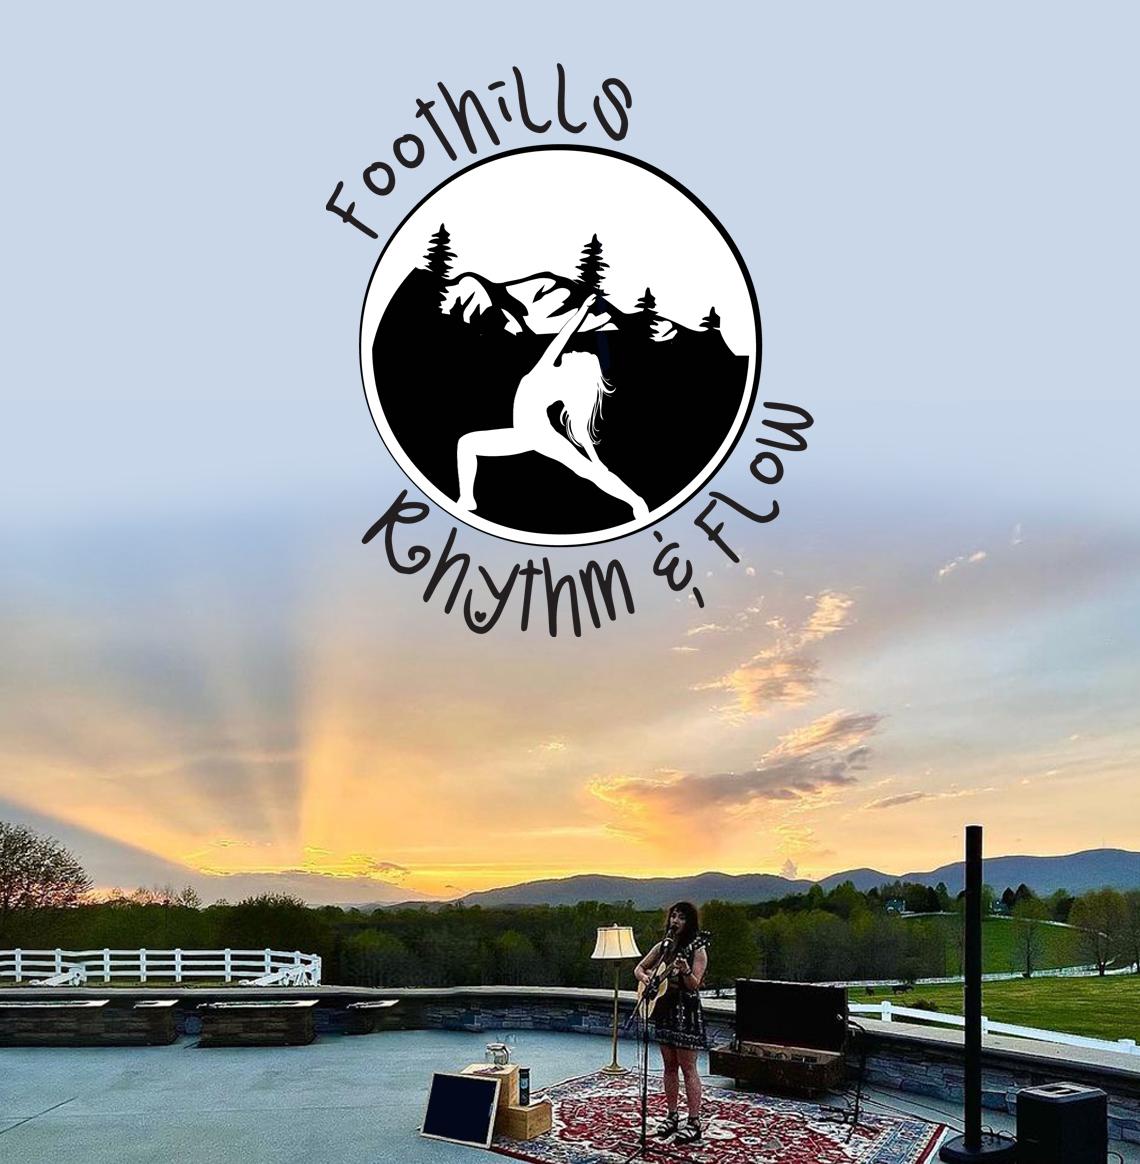 Foothills Rhythm and Flow Festival